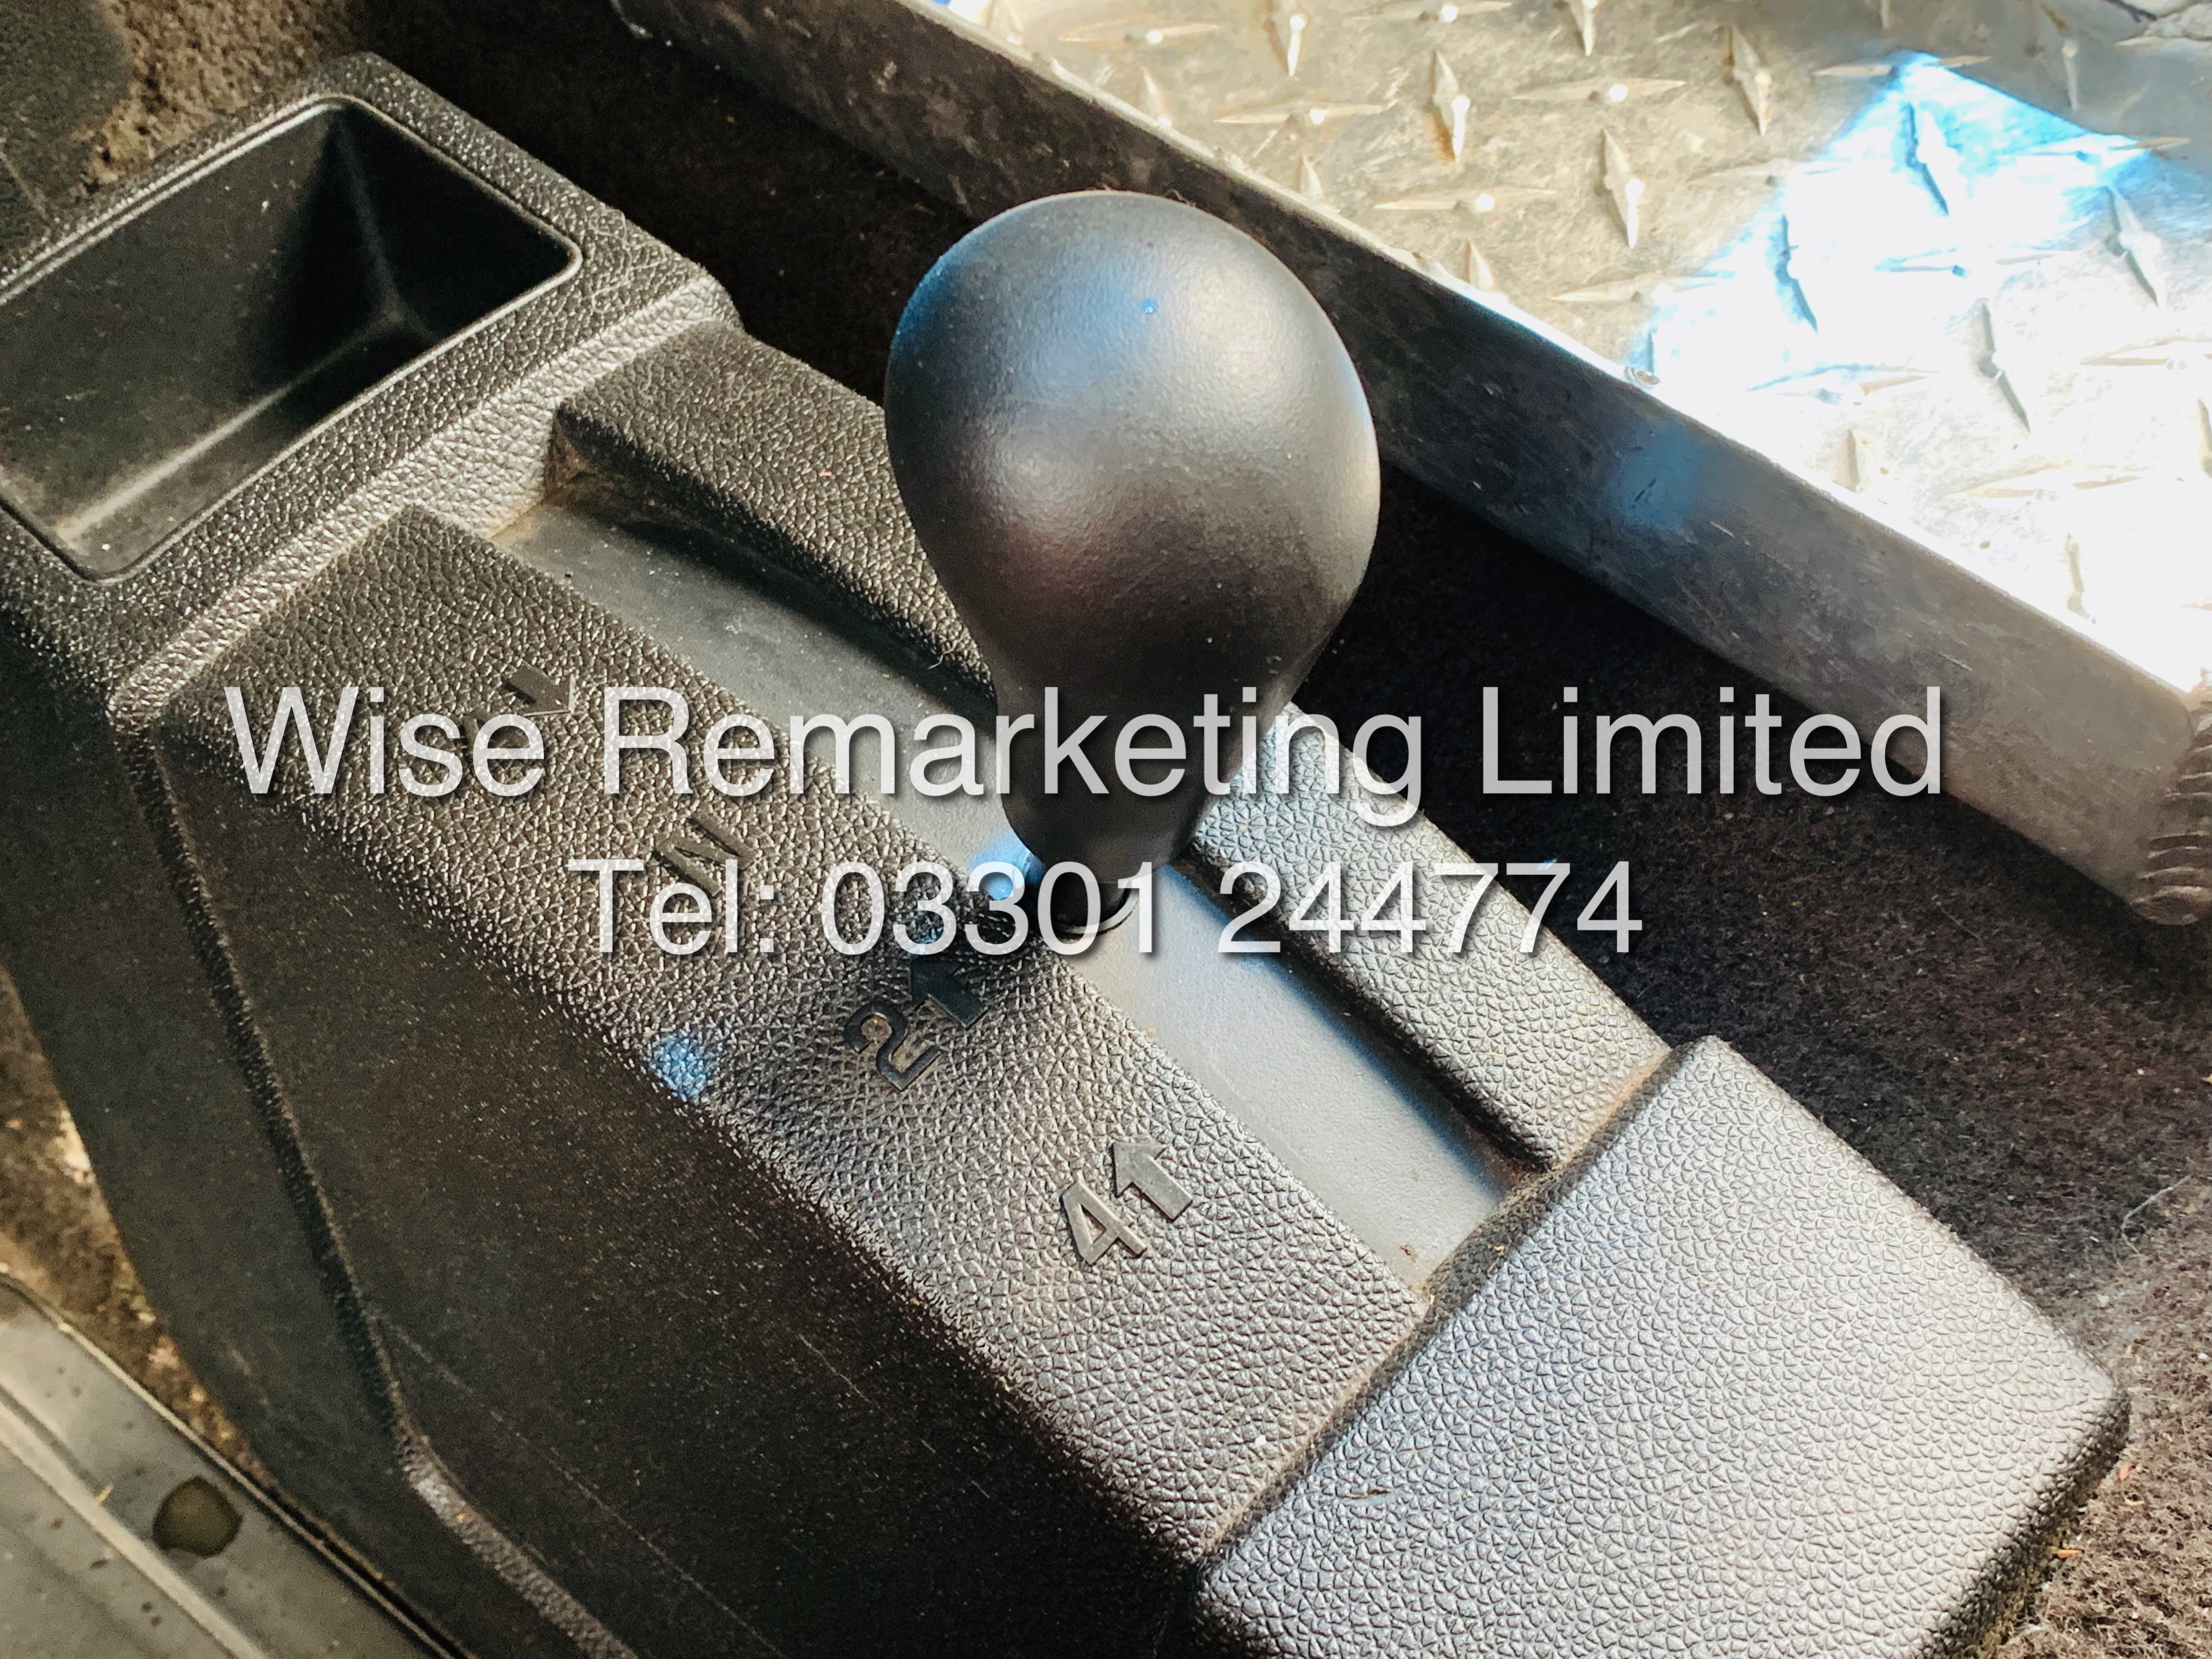 CHEVROLET SILVERADO 4.8L V8 LT1 KING-CAB 4X4**2007**FRESH IMPORT**IN METALLIC BLACK** - Image 20 of 22